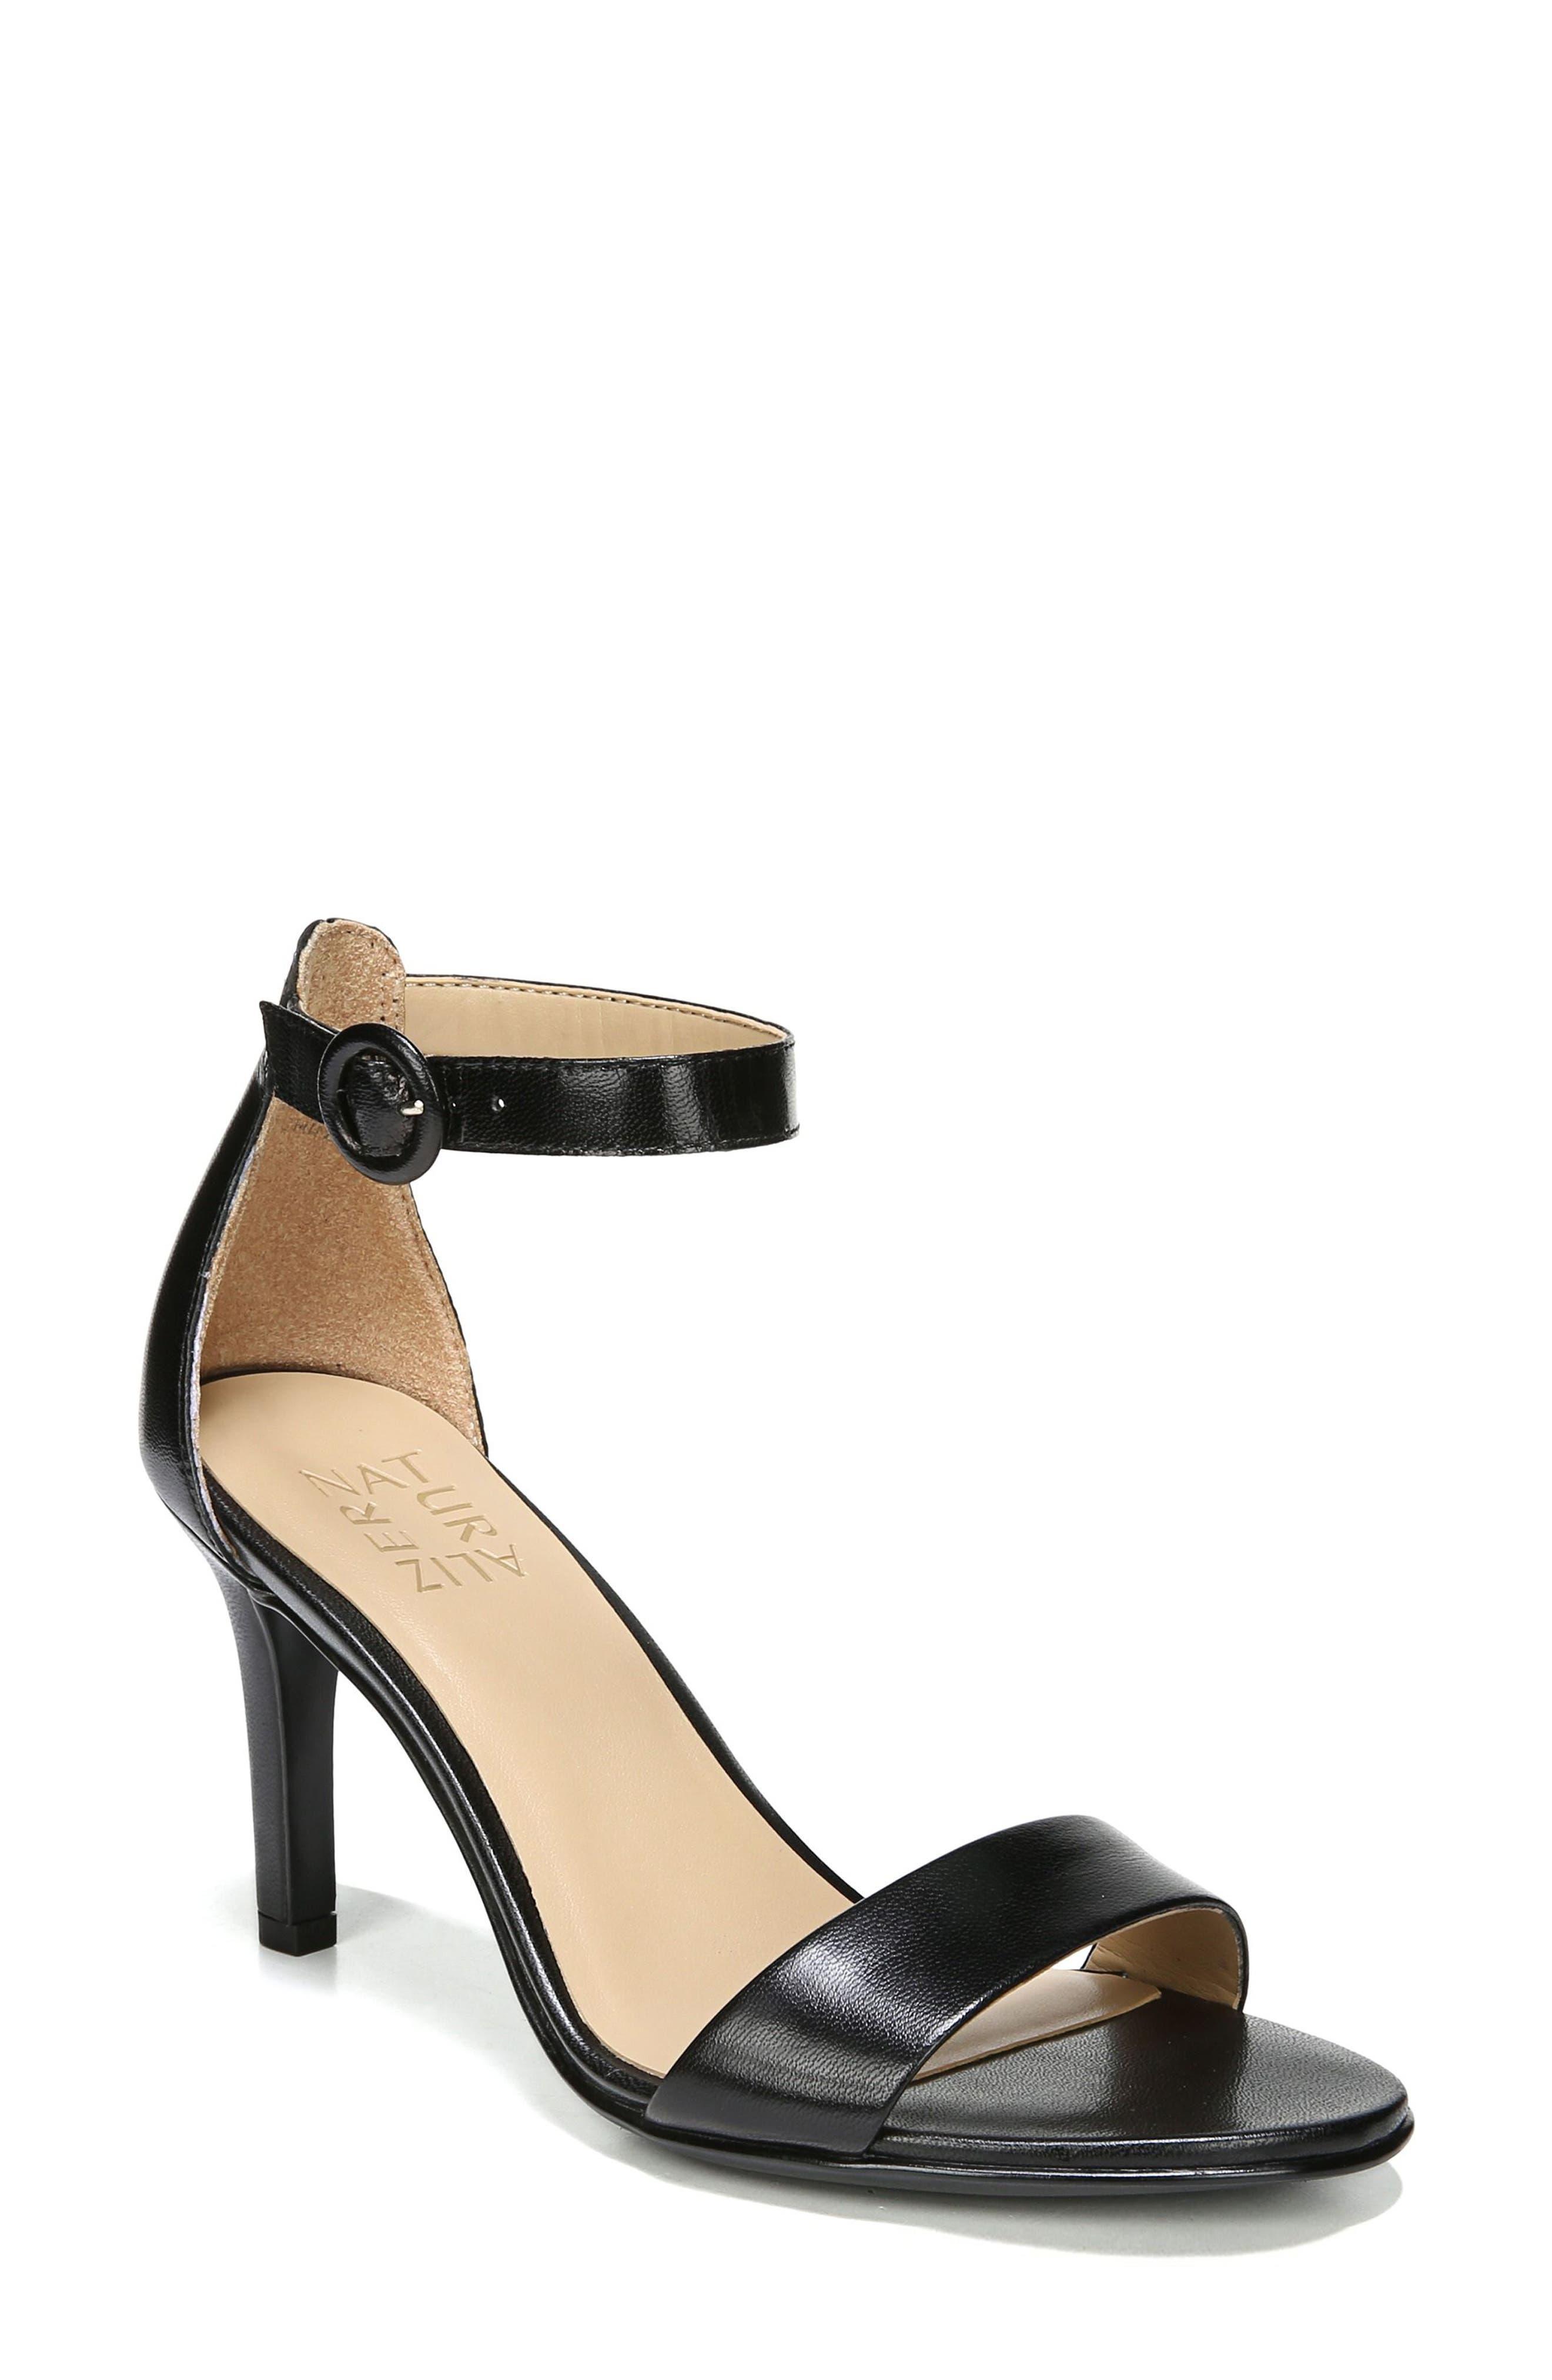 NATURALIZER, Kinsley Ankle Strap Sandal, Main thumbnail 1, color, BLACK LEATHER